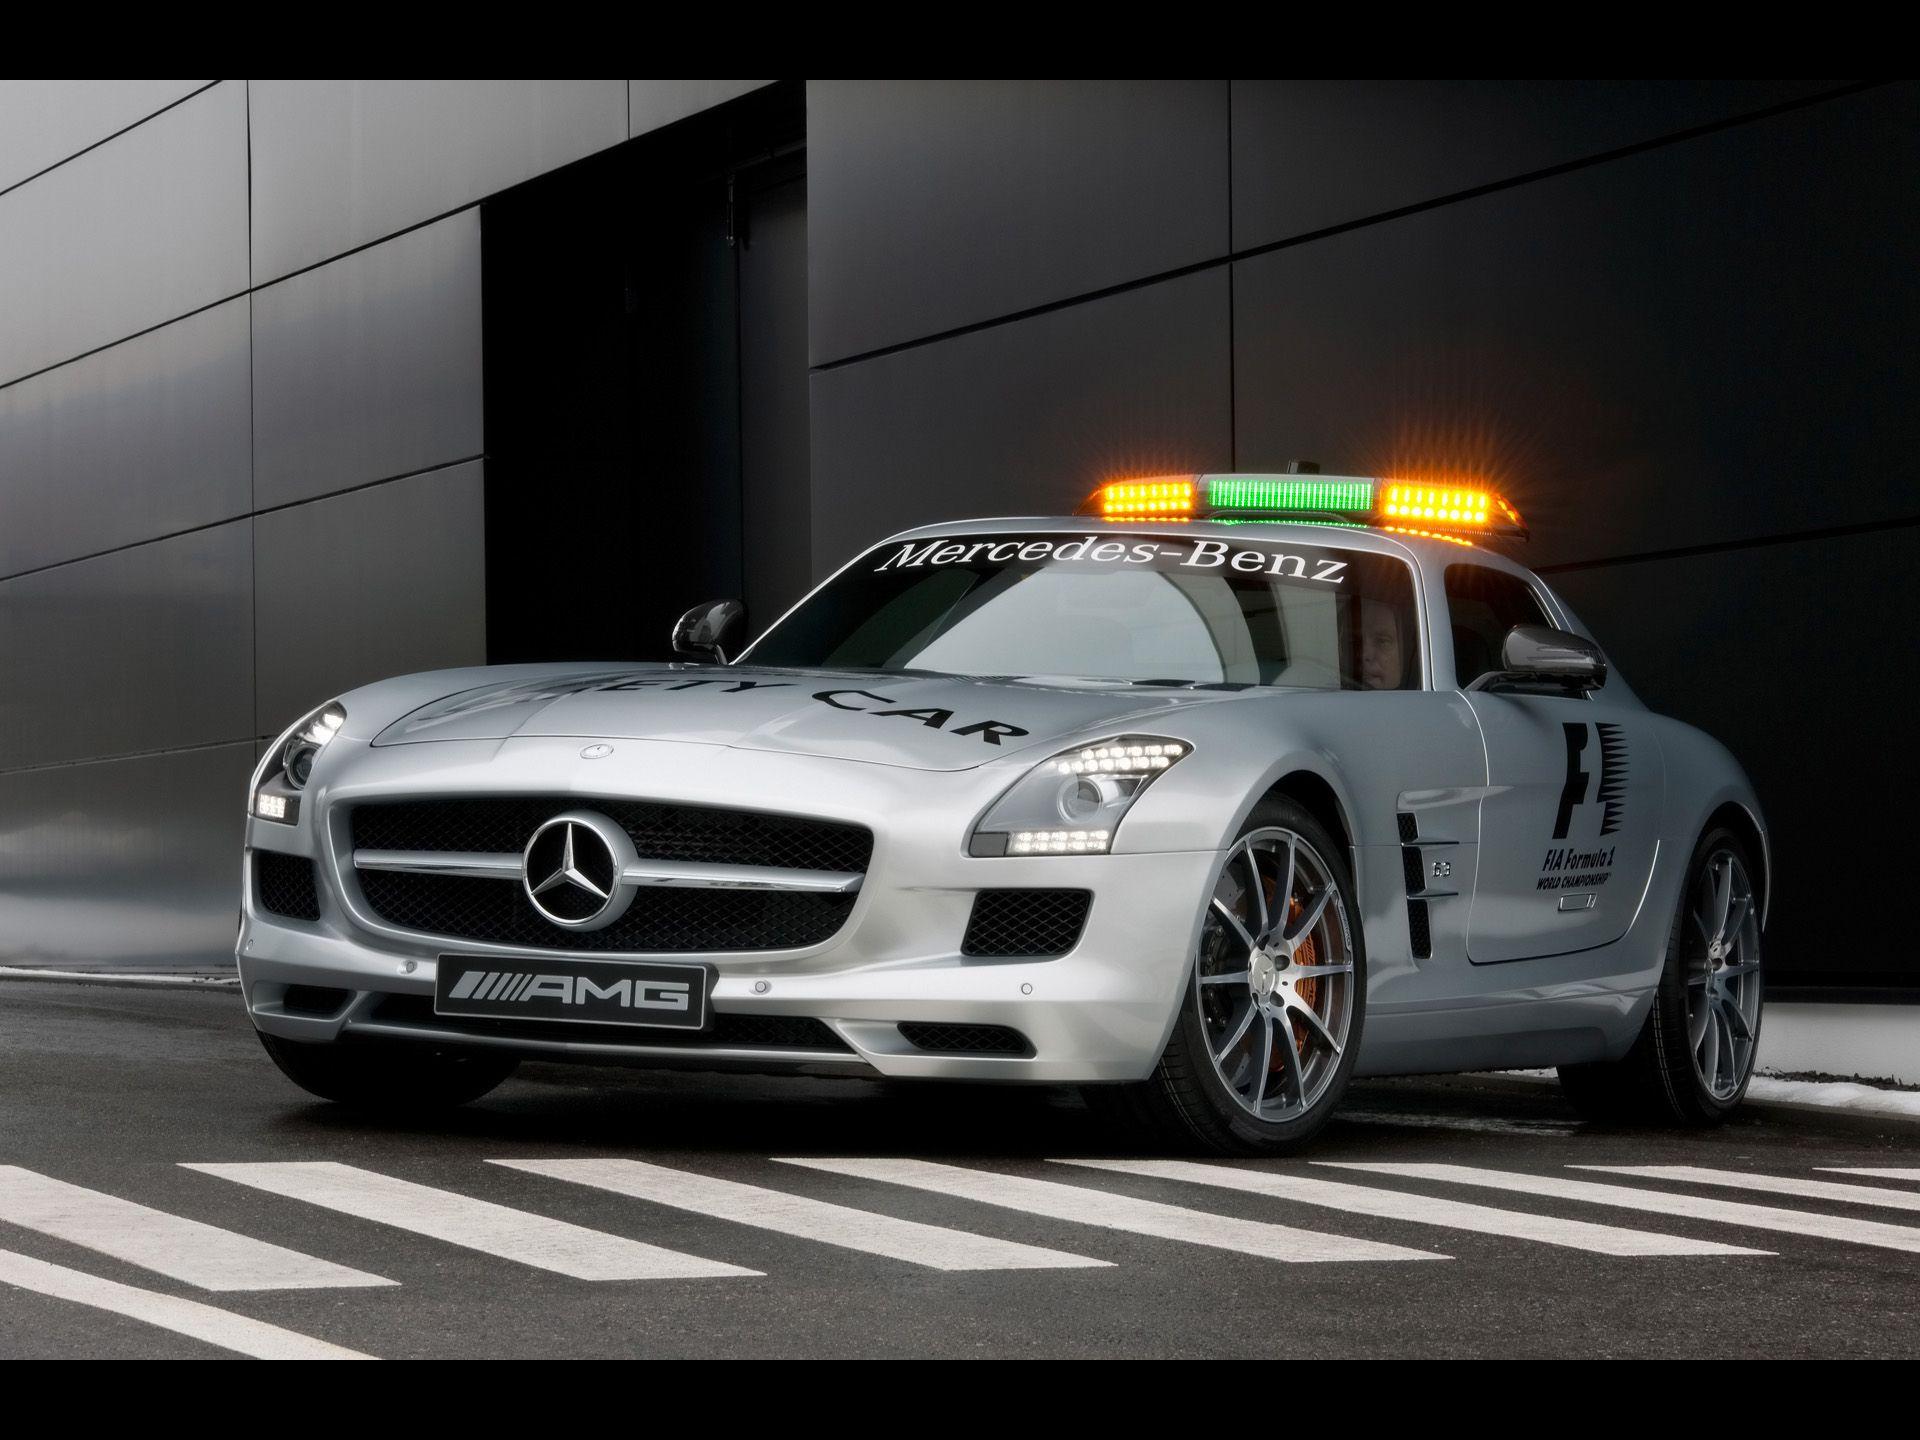 2010 Mercedes Benz Sls Amg Speedshift Coupe White Red Leader